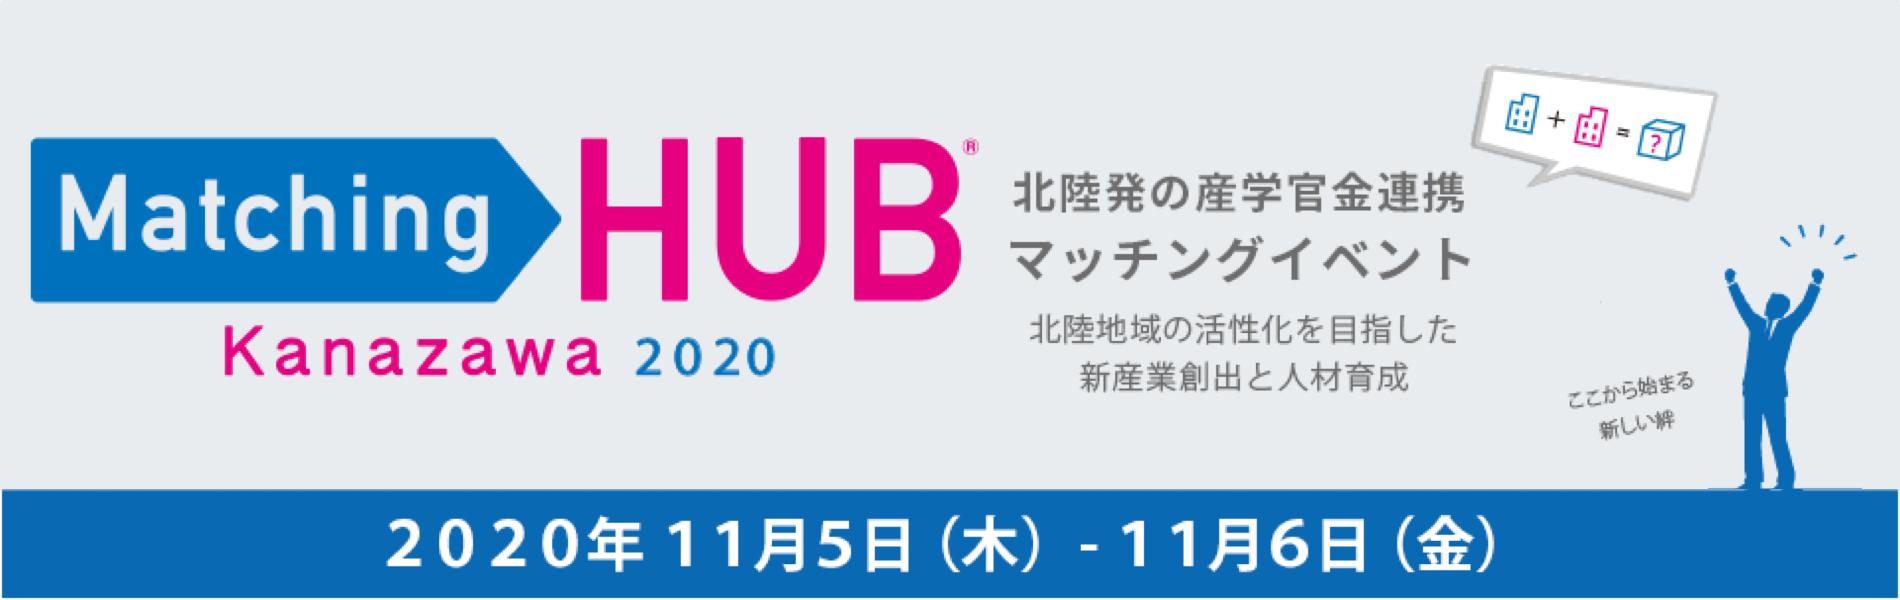 Matching-HUB 2020